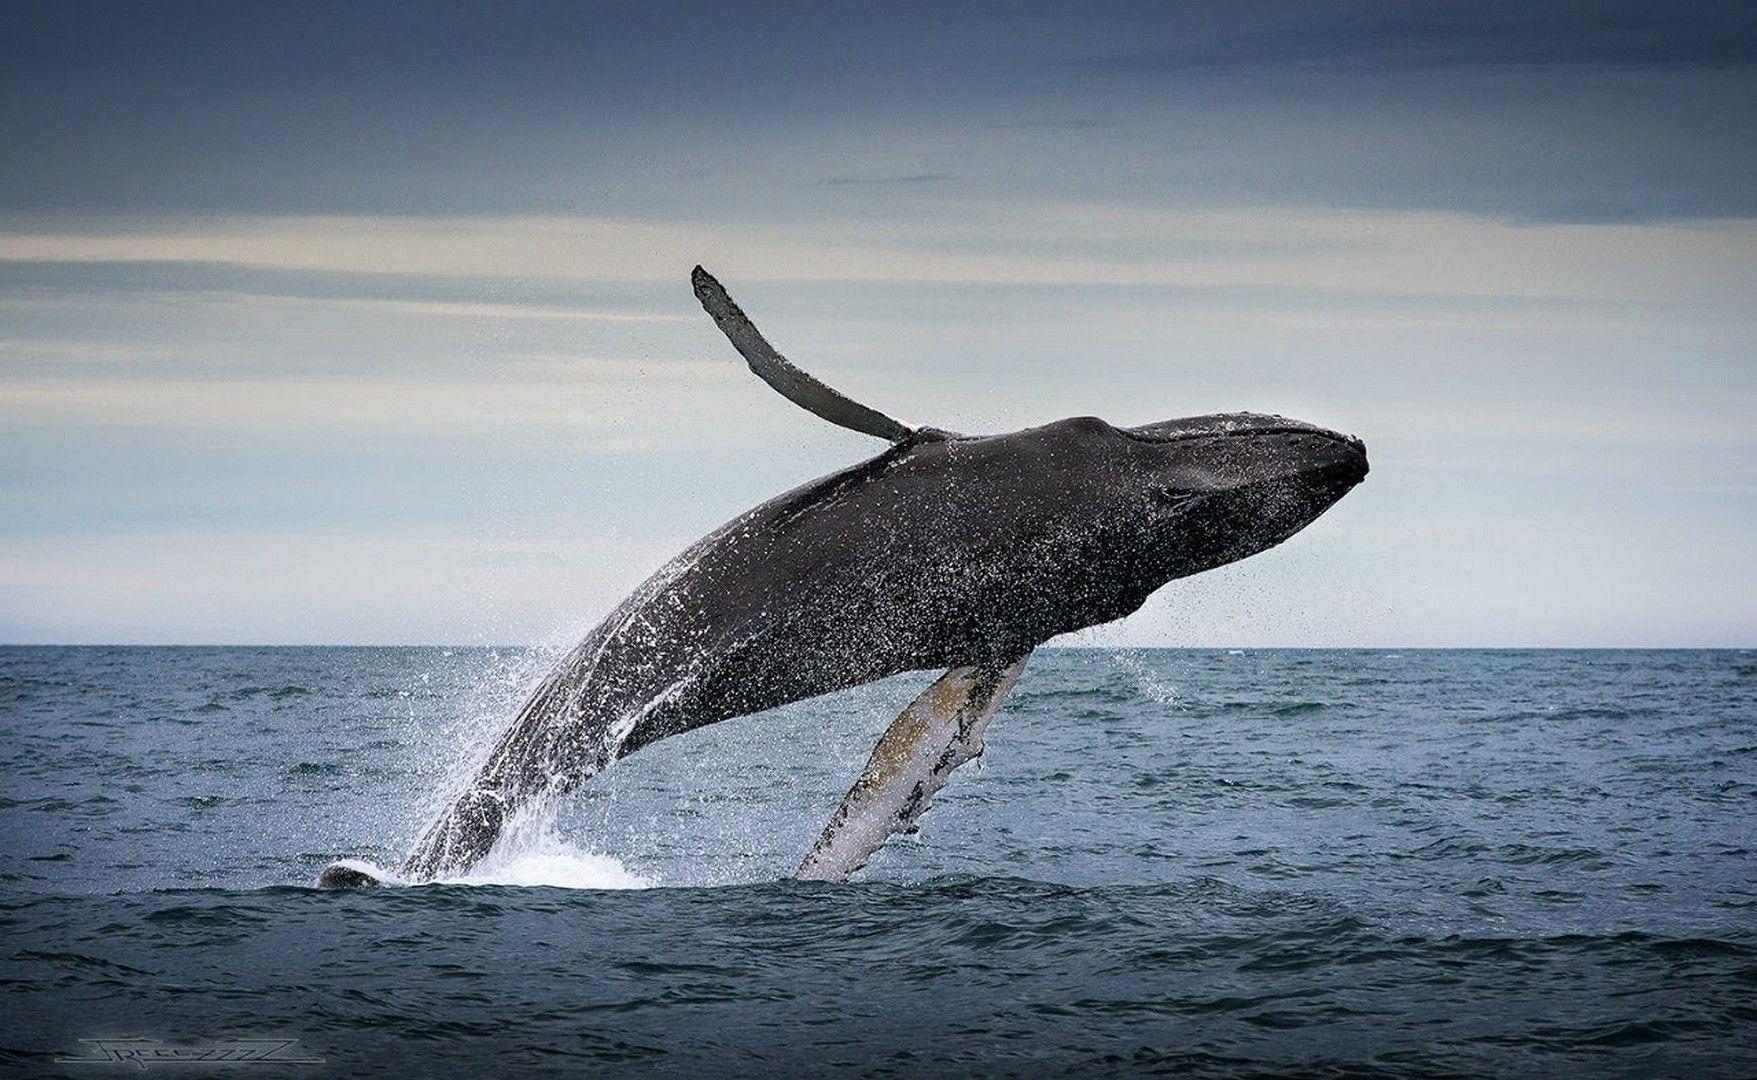 Hd Humpback Whale Wallpaper Whale Humpback Whale Animals